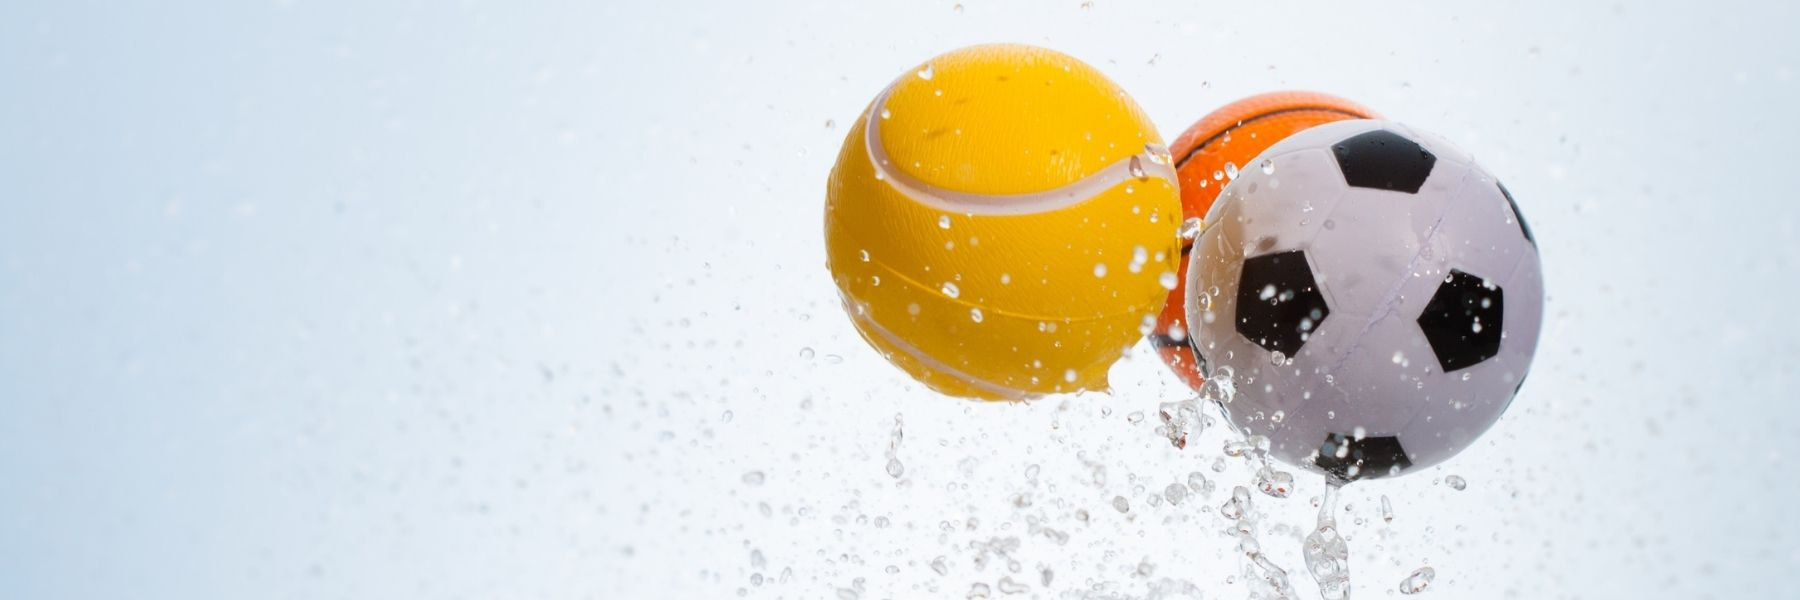 Balls bouncing and trailing water drops